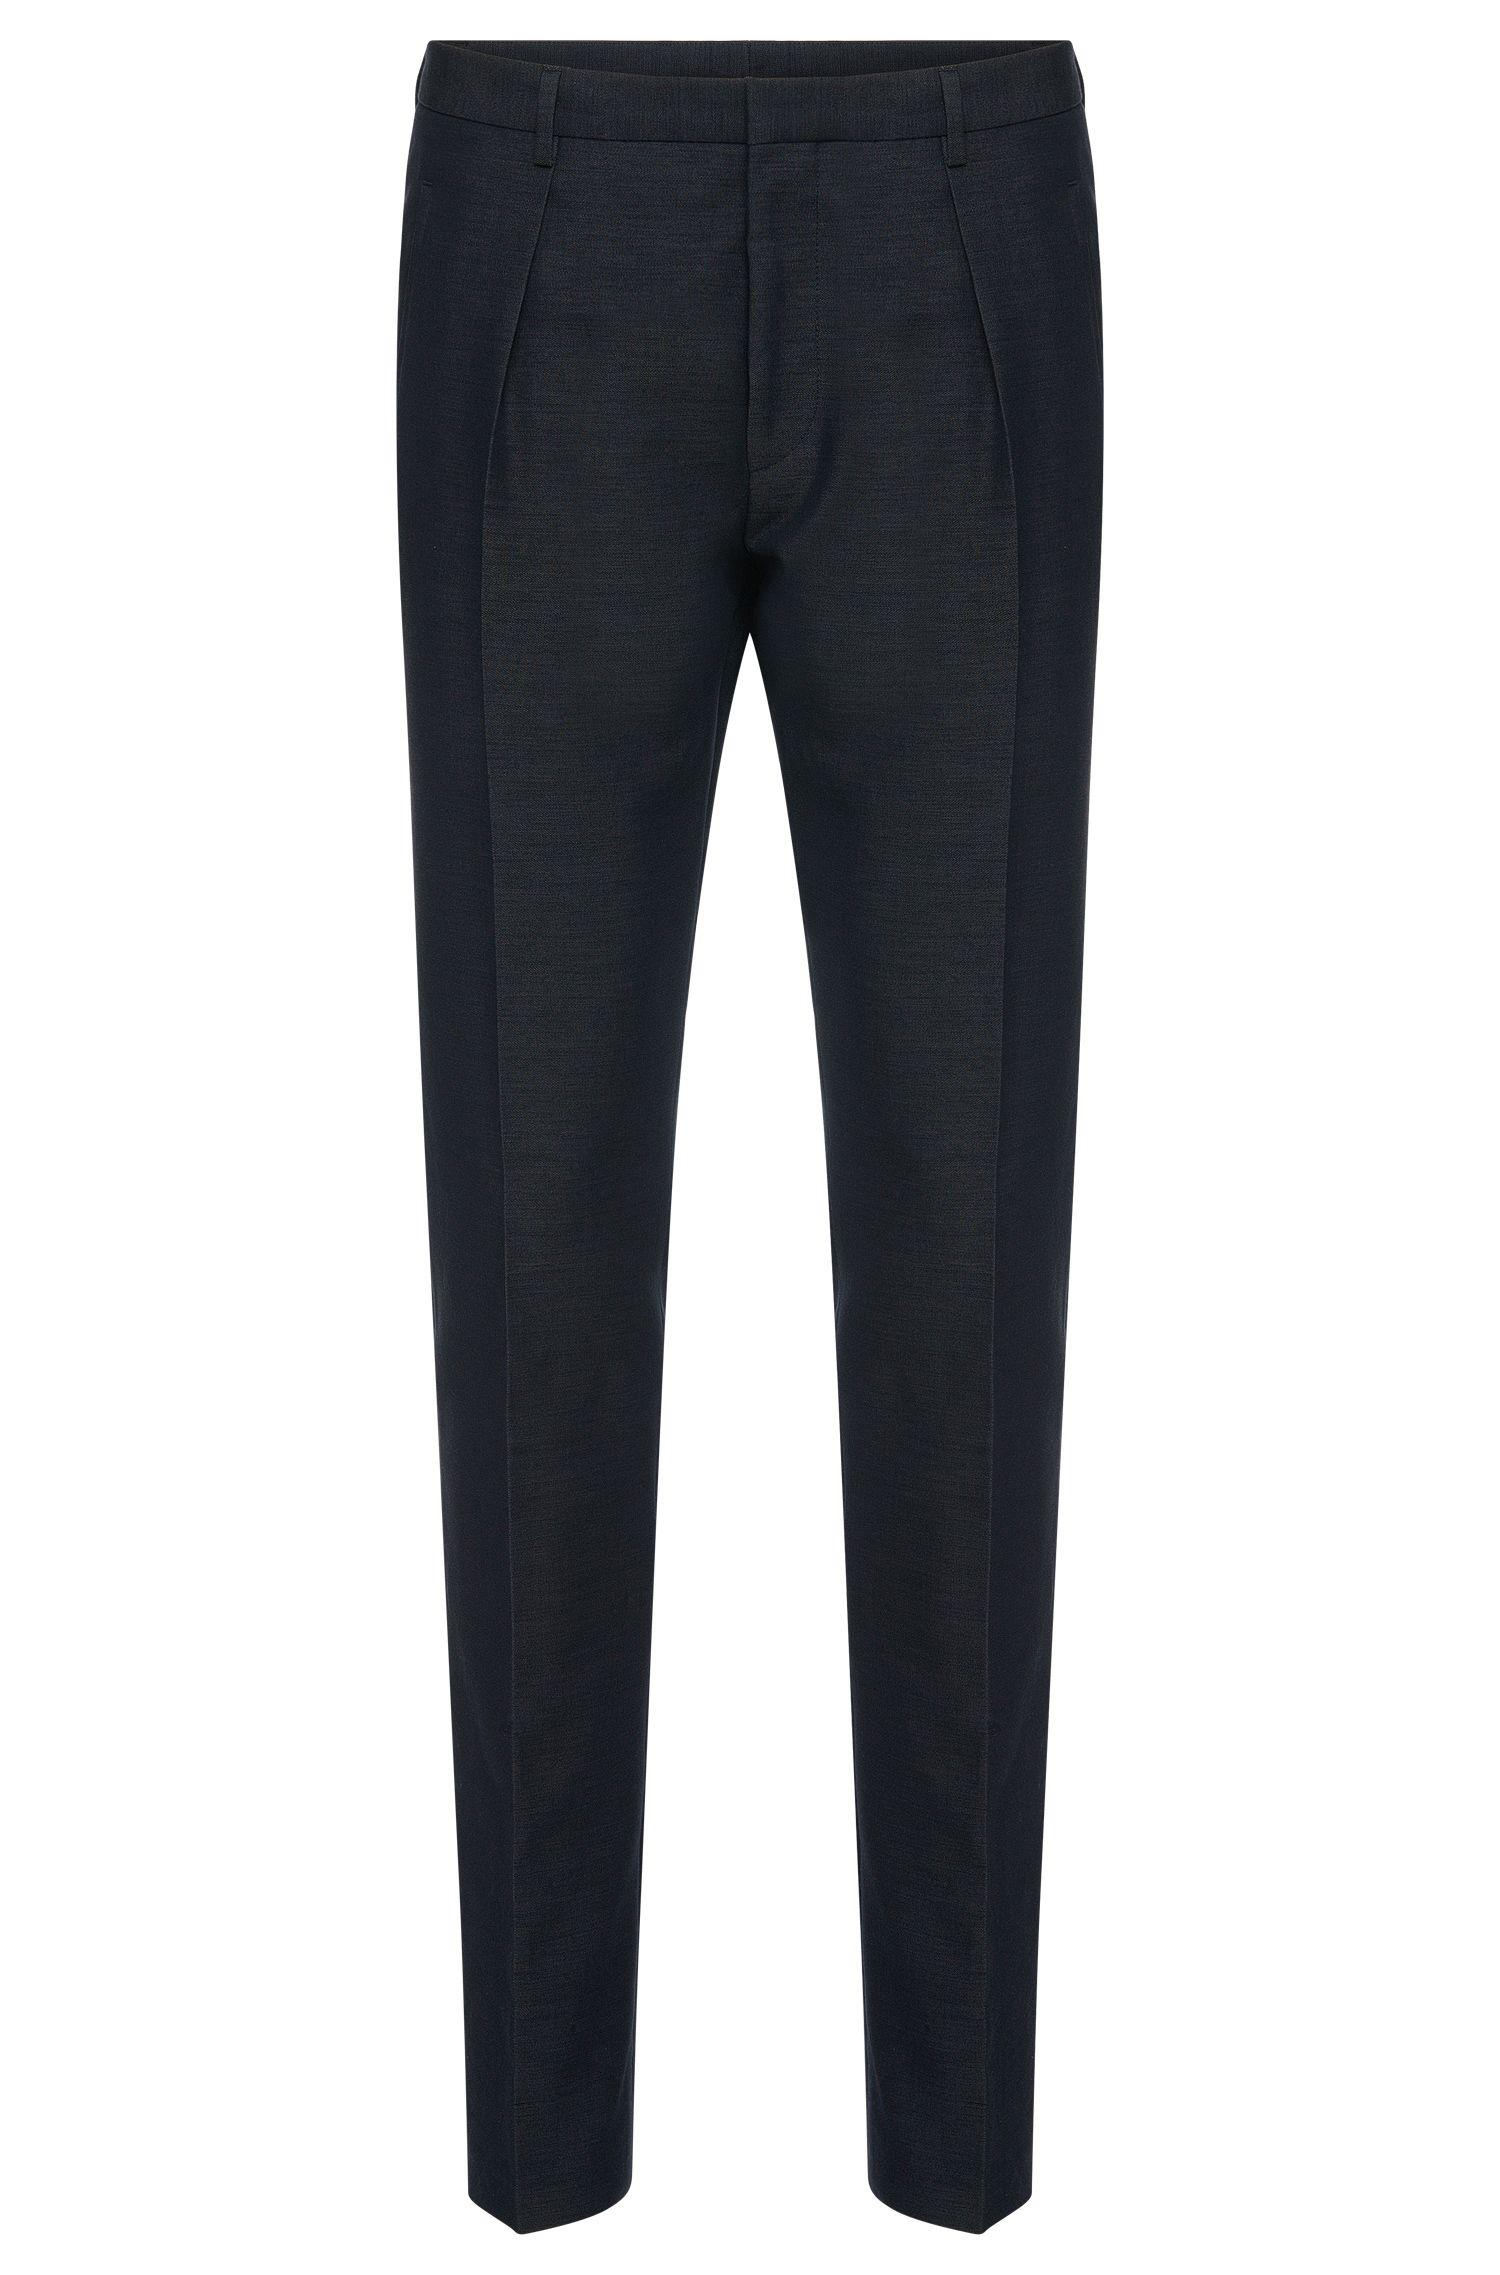 'Per' | Slim Fit, Cotton Silk Dress Pants